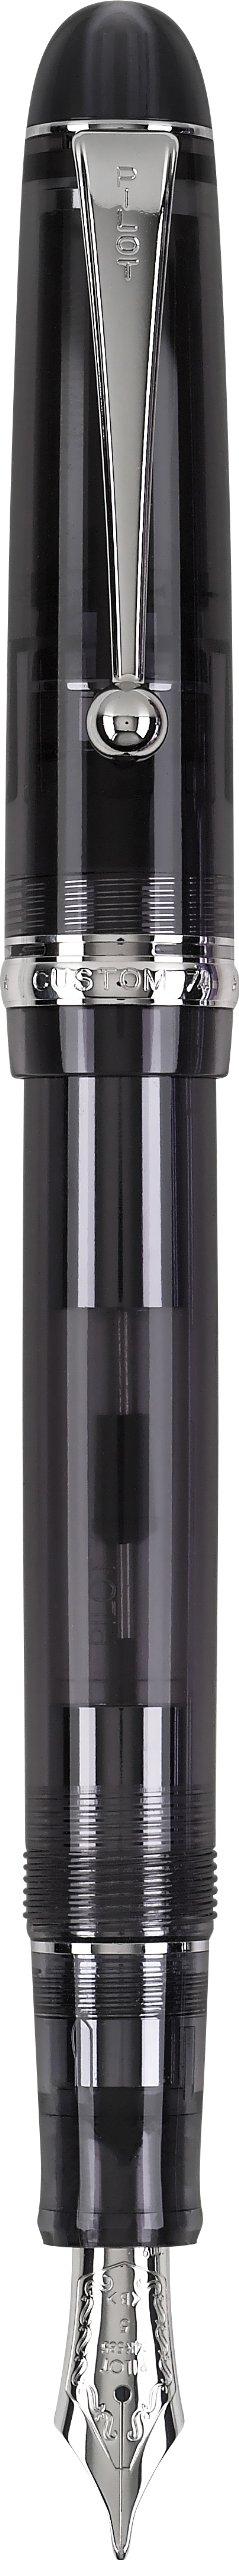 PILOT Custom 74 Fountain Pen, Black Smoke Barrel, Medium Nib (60955)